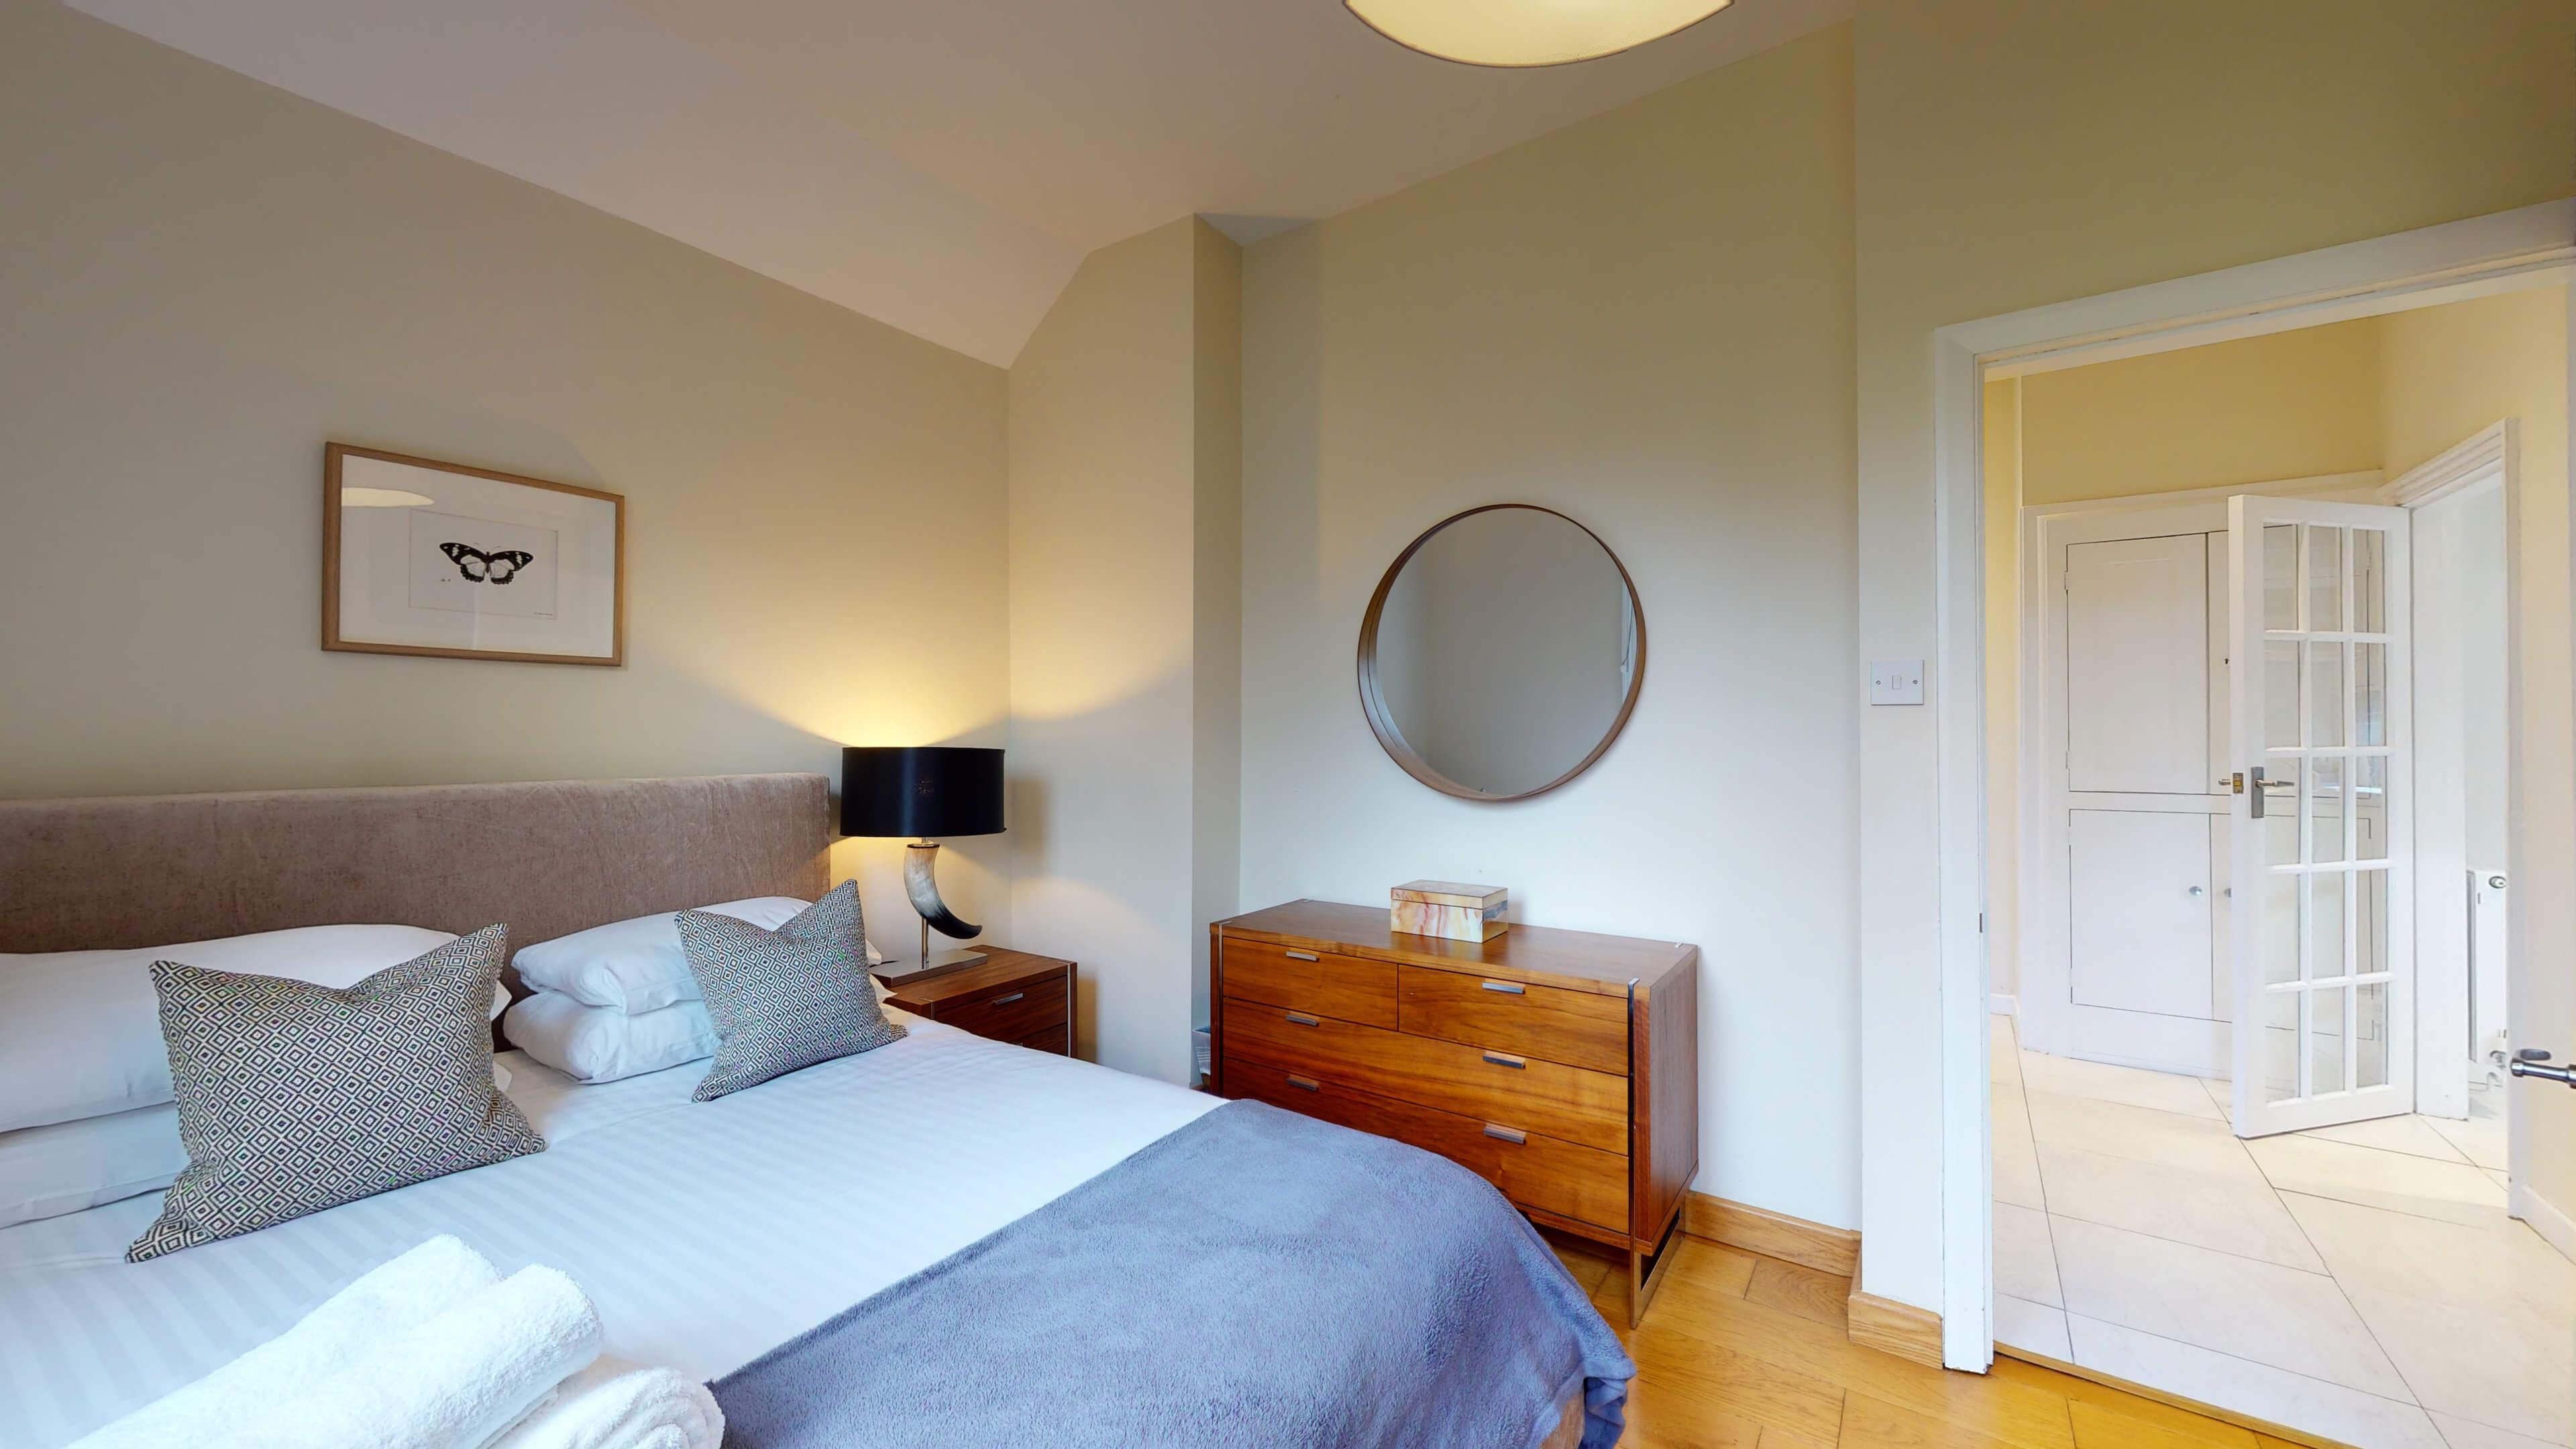 10A Rawlinson Road Rawlinson Road Bedroom 2